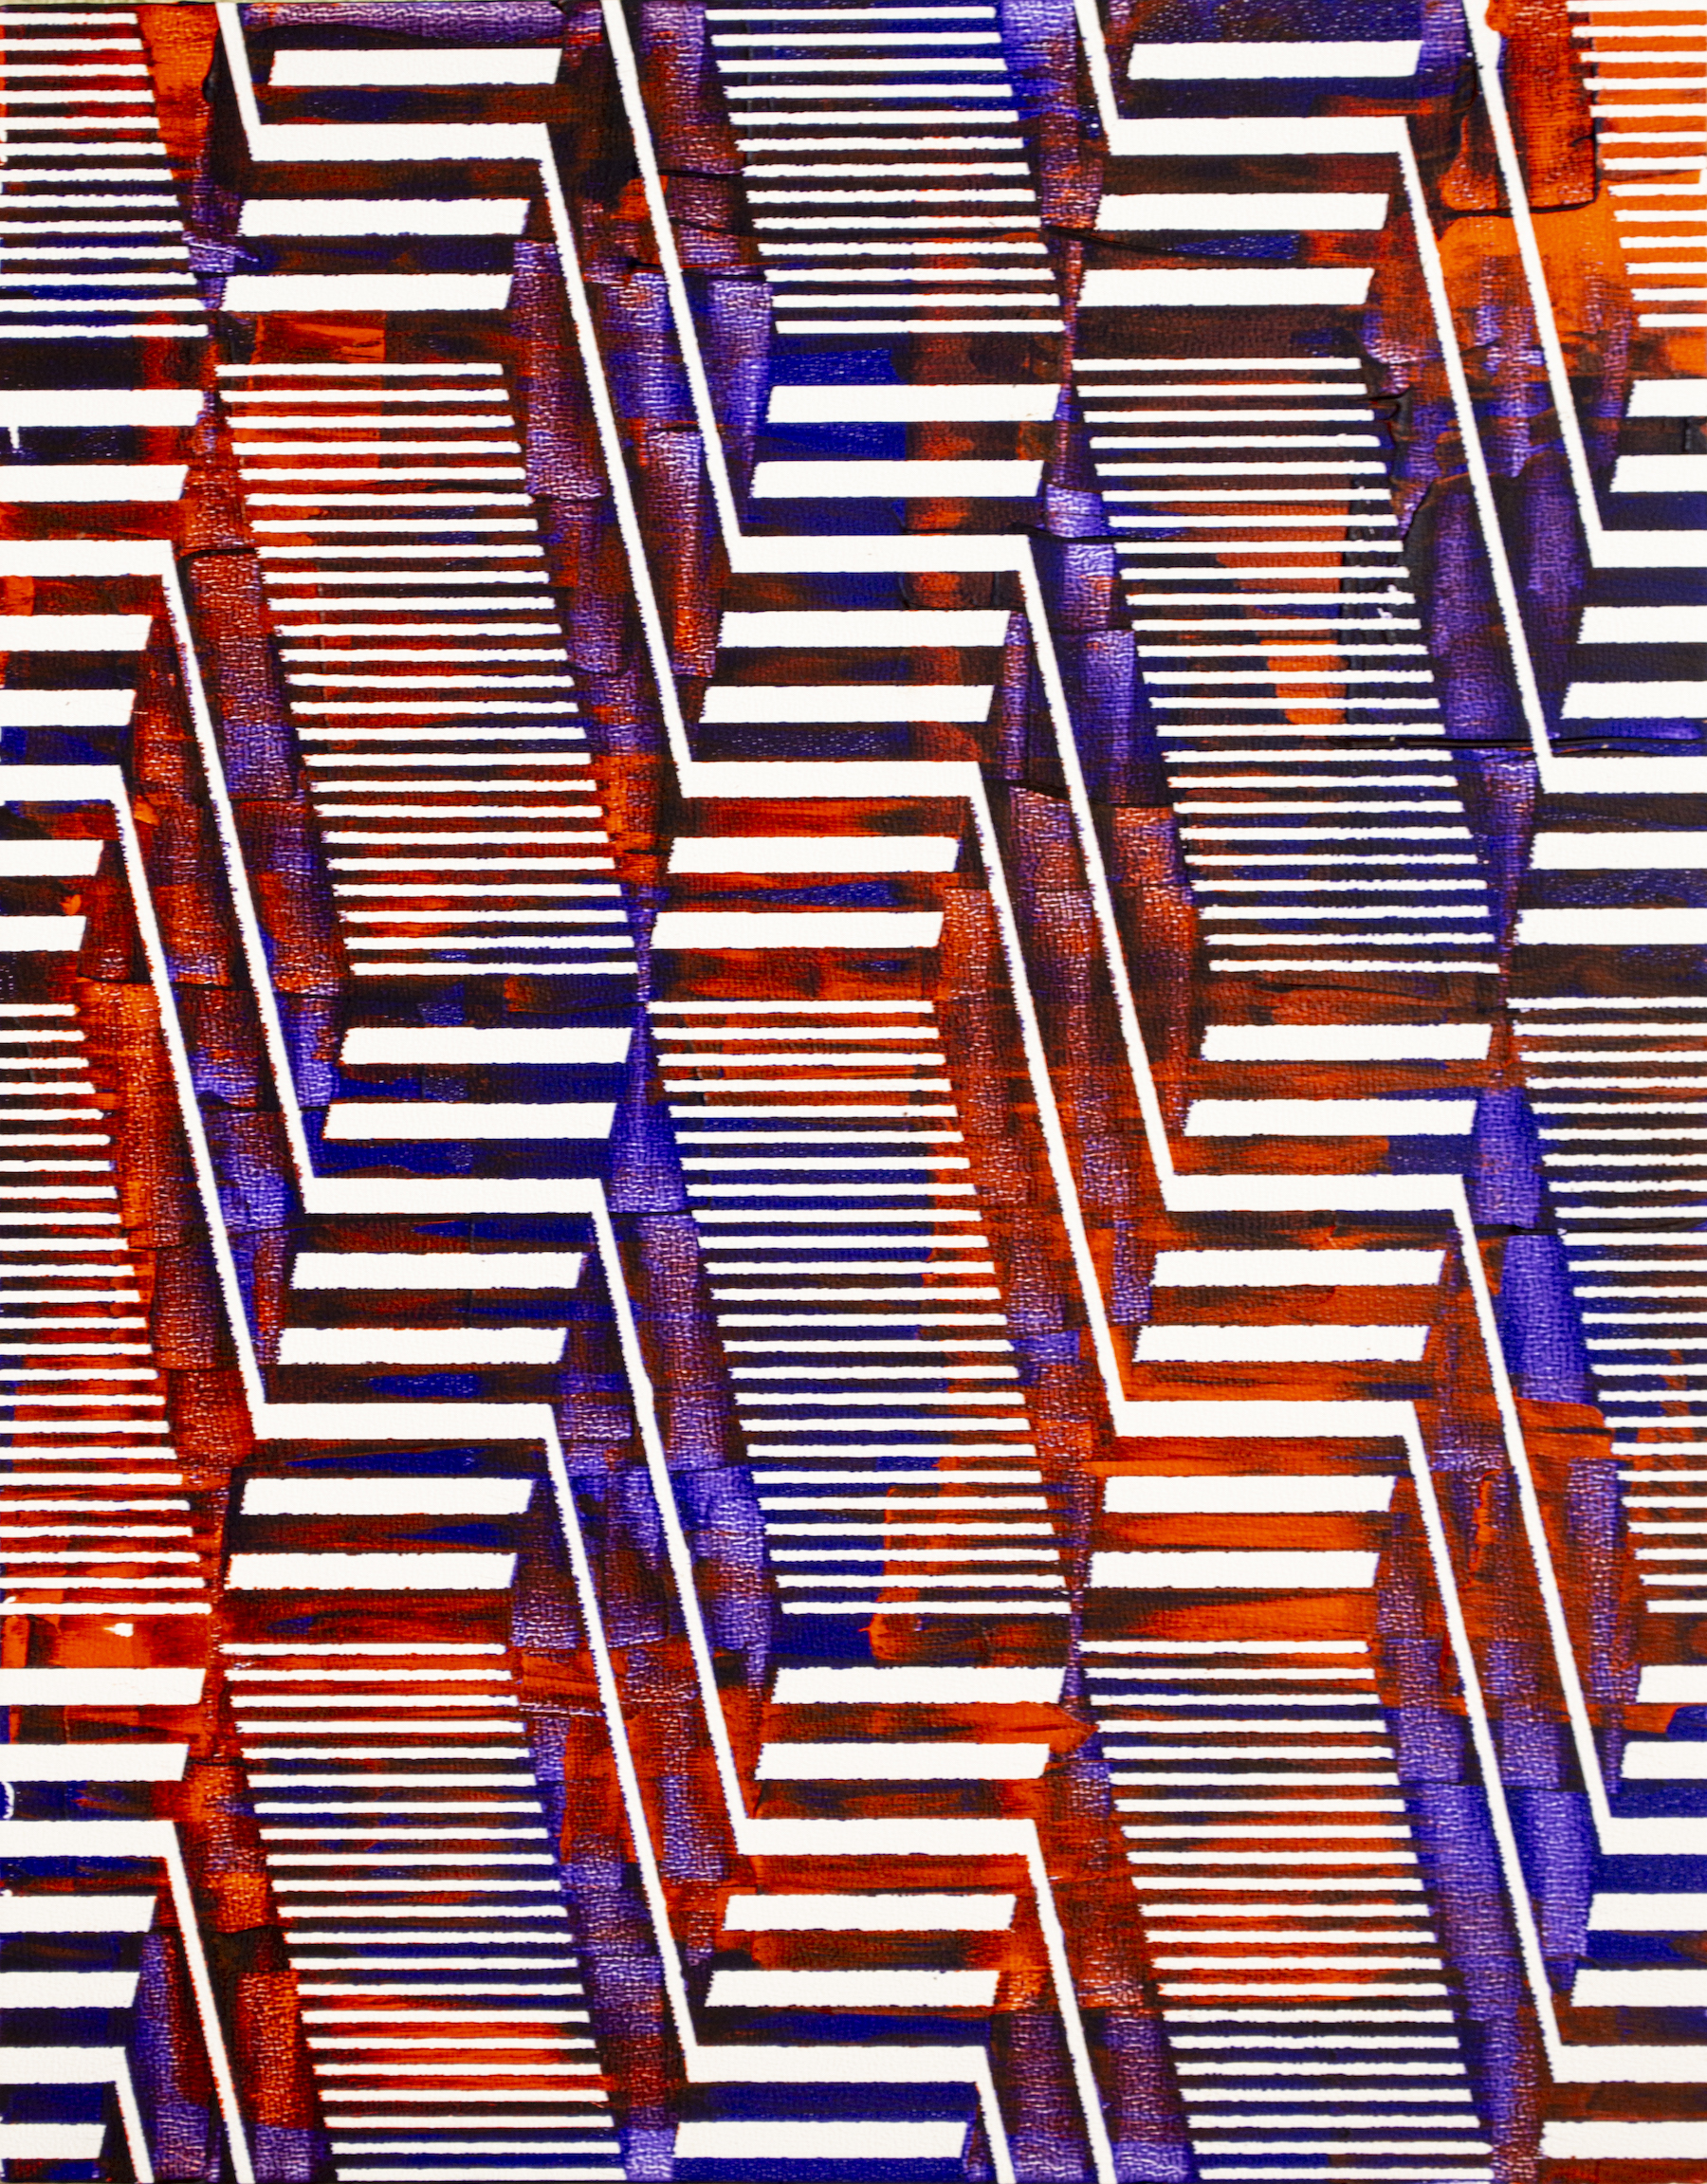 HUE Gallery of Contemporary Art - Sean Christopher Ward - Evolving Metropolis - Acrylic on MDF - 11x14 - 2018 - $300.jpg